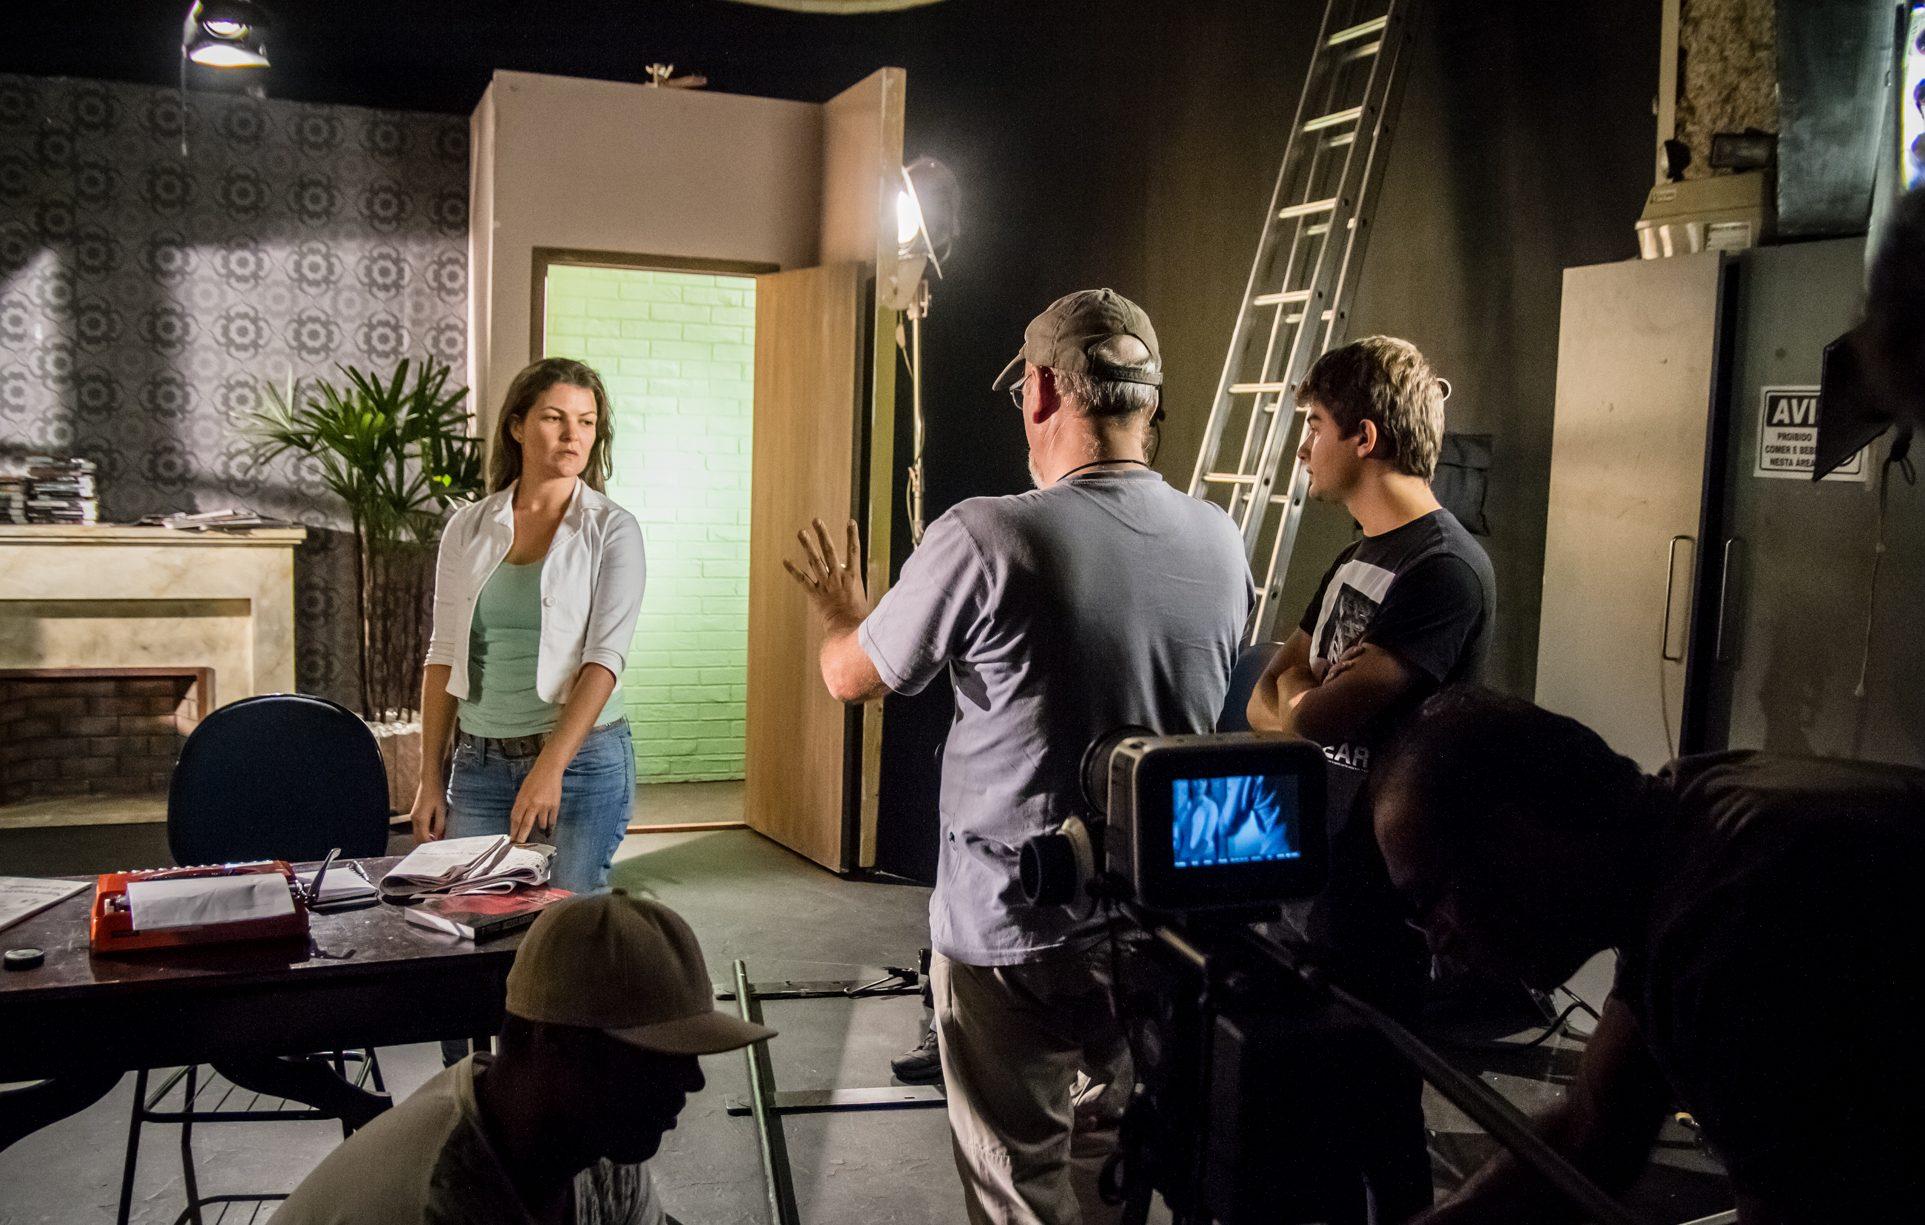 Descubra porque ser ator ou atriz e como se preparar